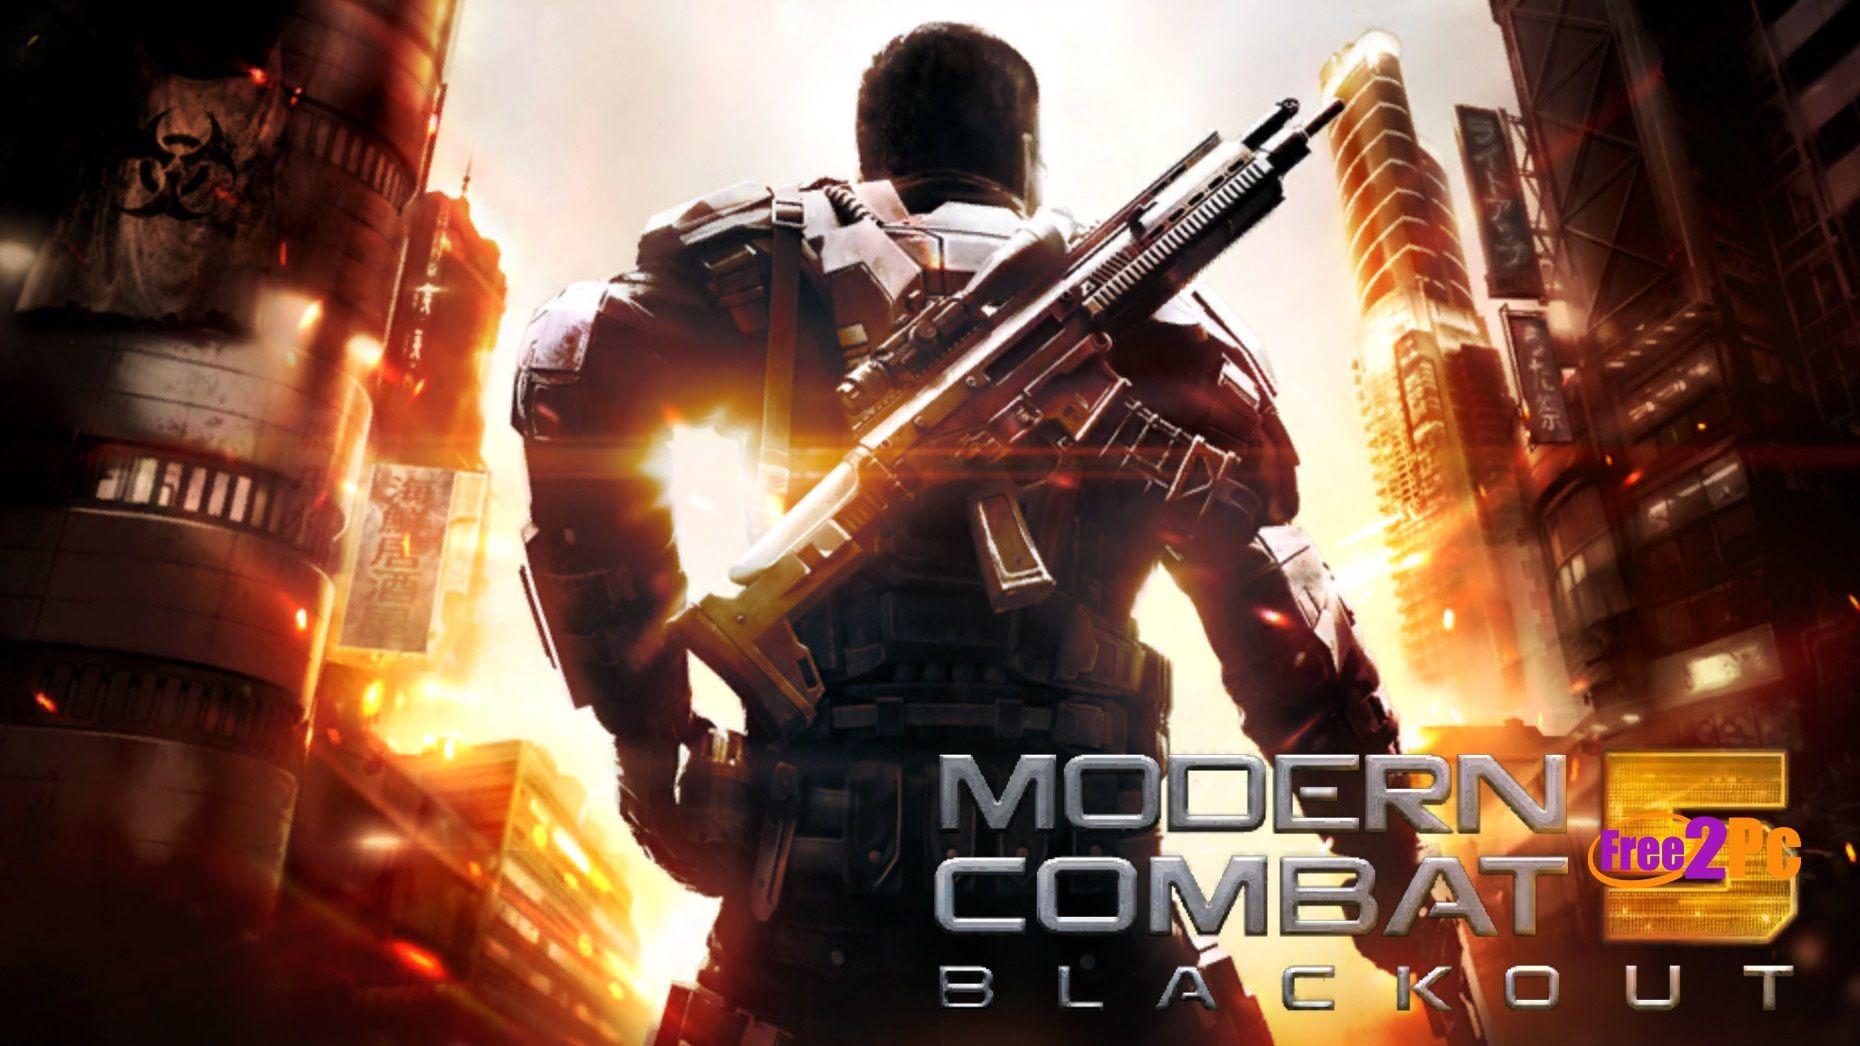 Modern Combat 5 Apk Data Download Free Full Version Blackout Game Combat Gameloft